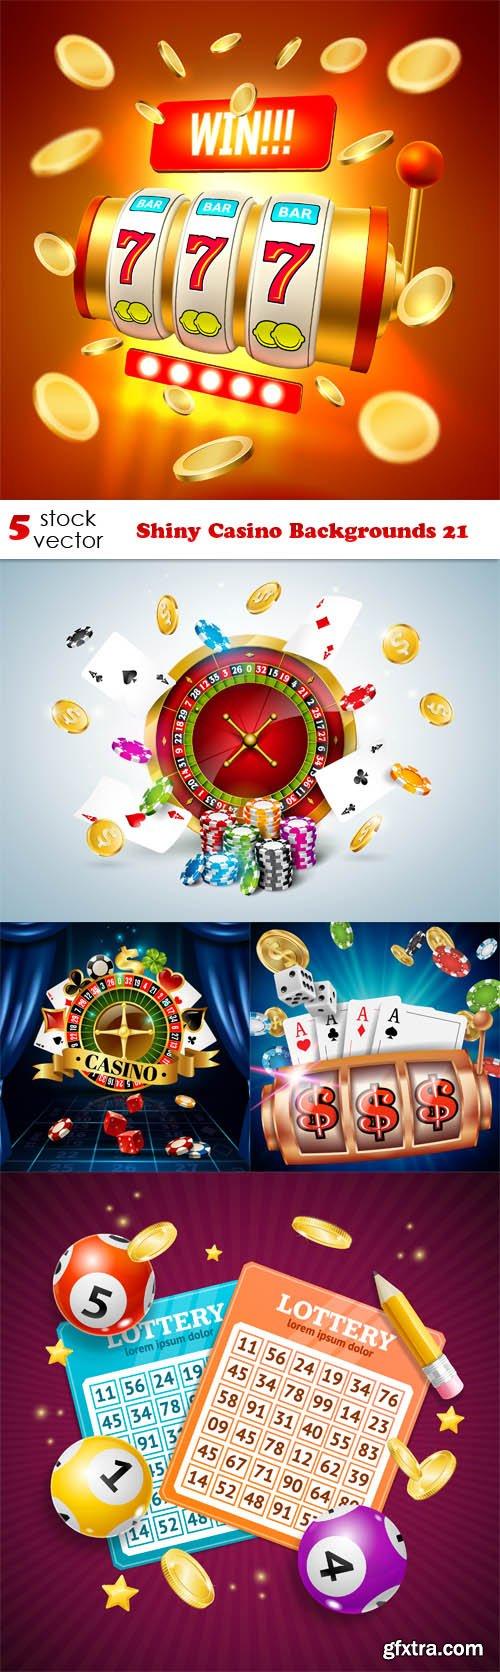 Vectors - Shiny Casino Backgrounds 21